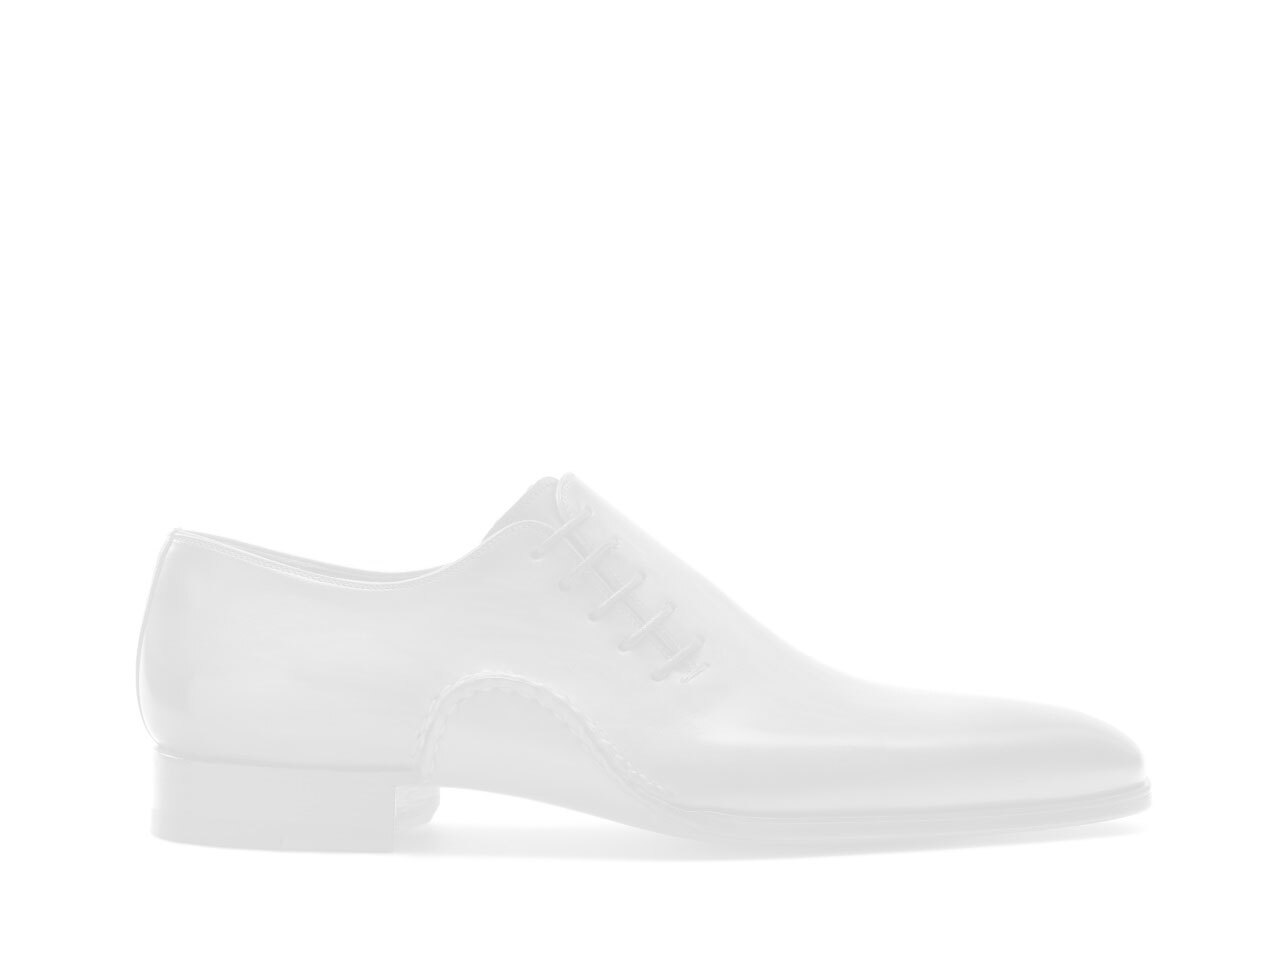 Cuero light brown lace up oxford shoes for men - Magnanni